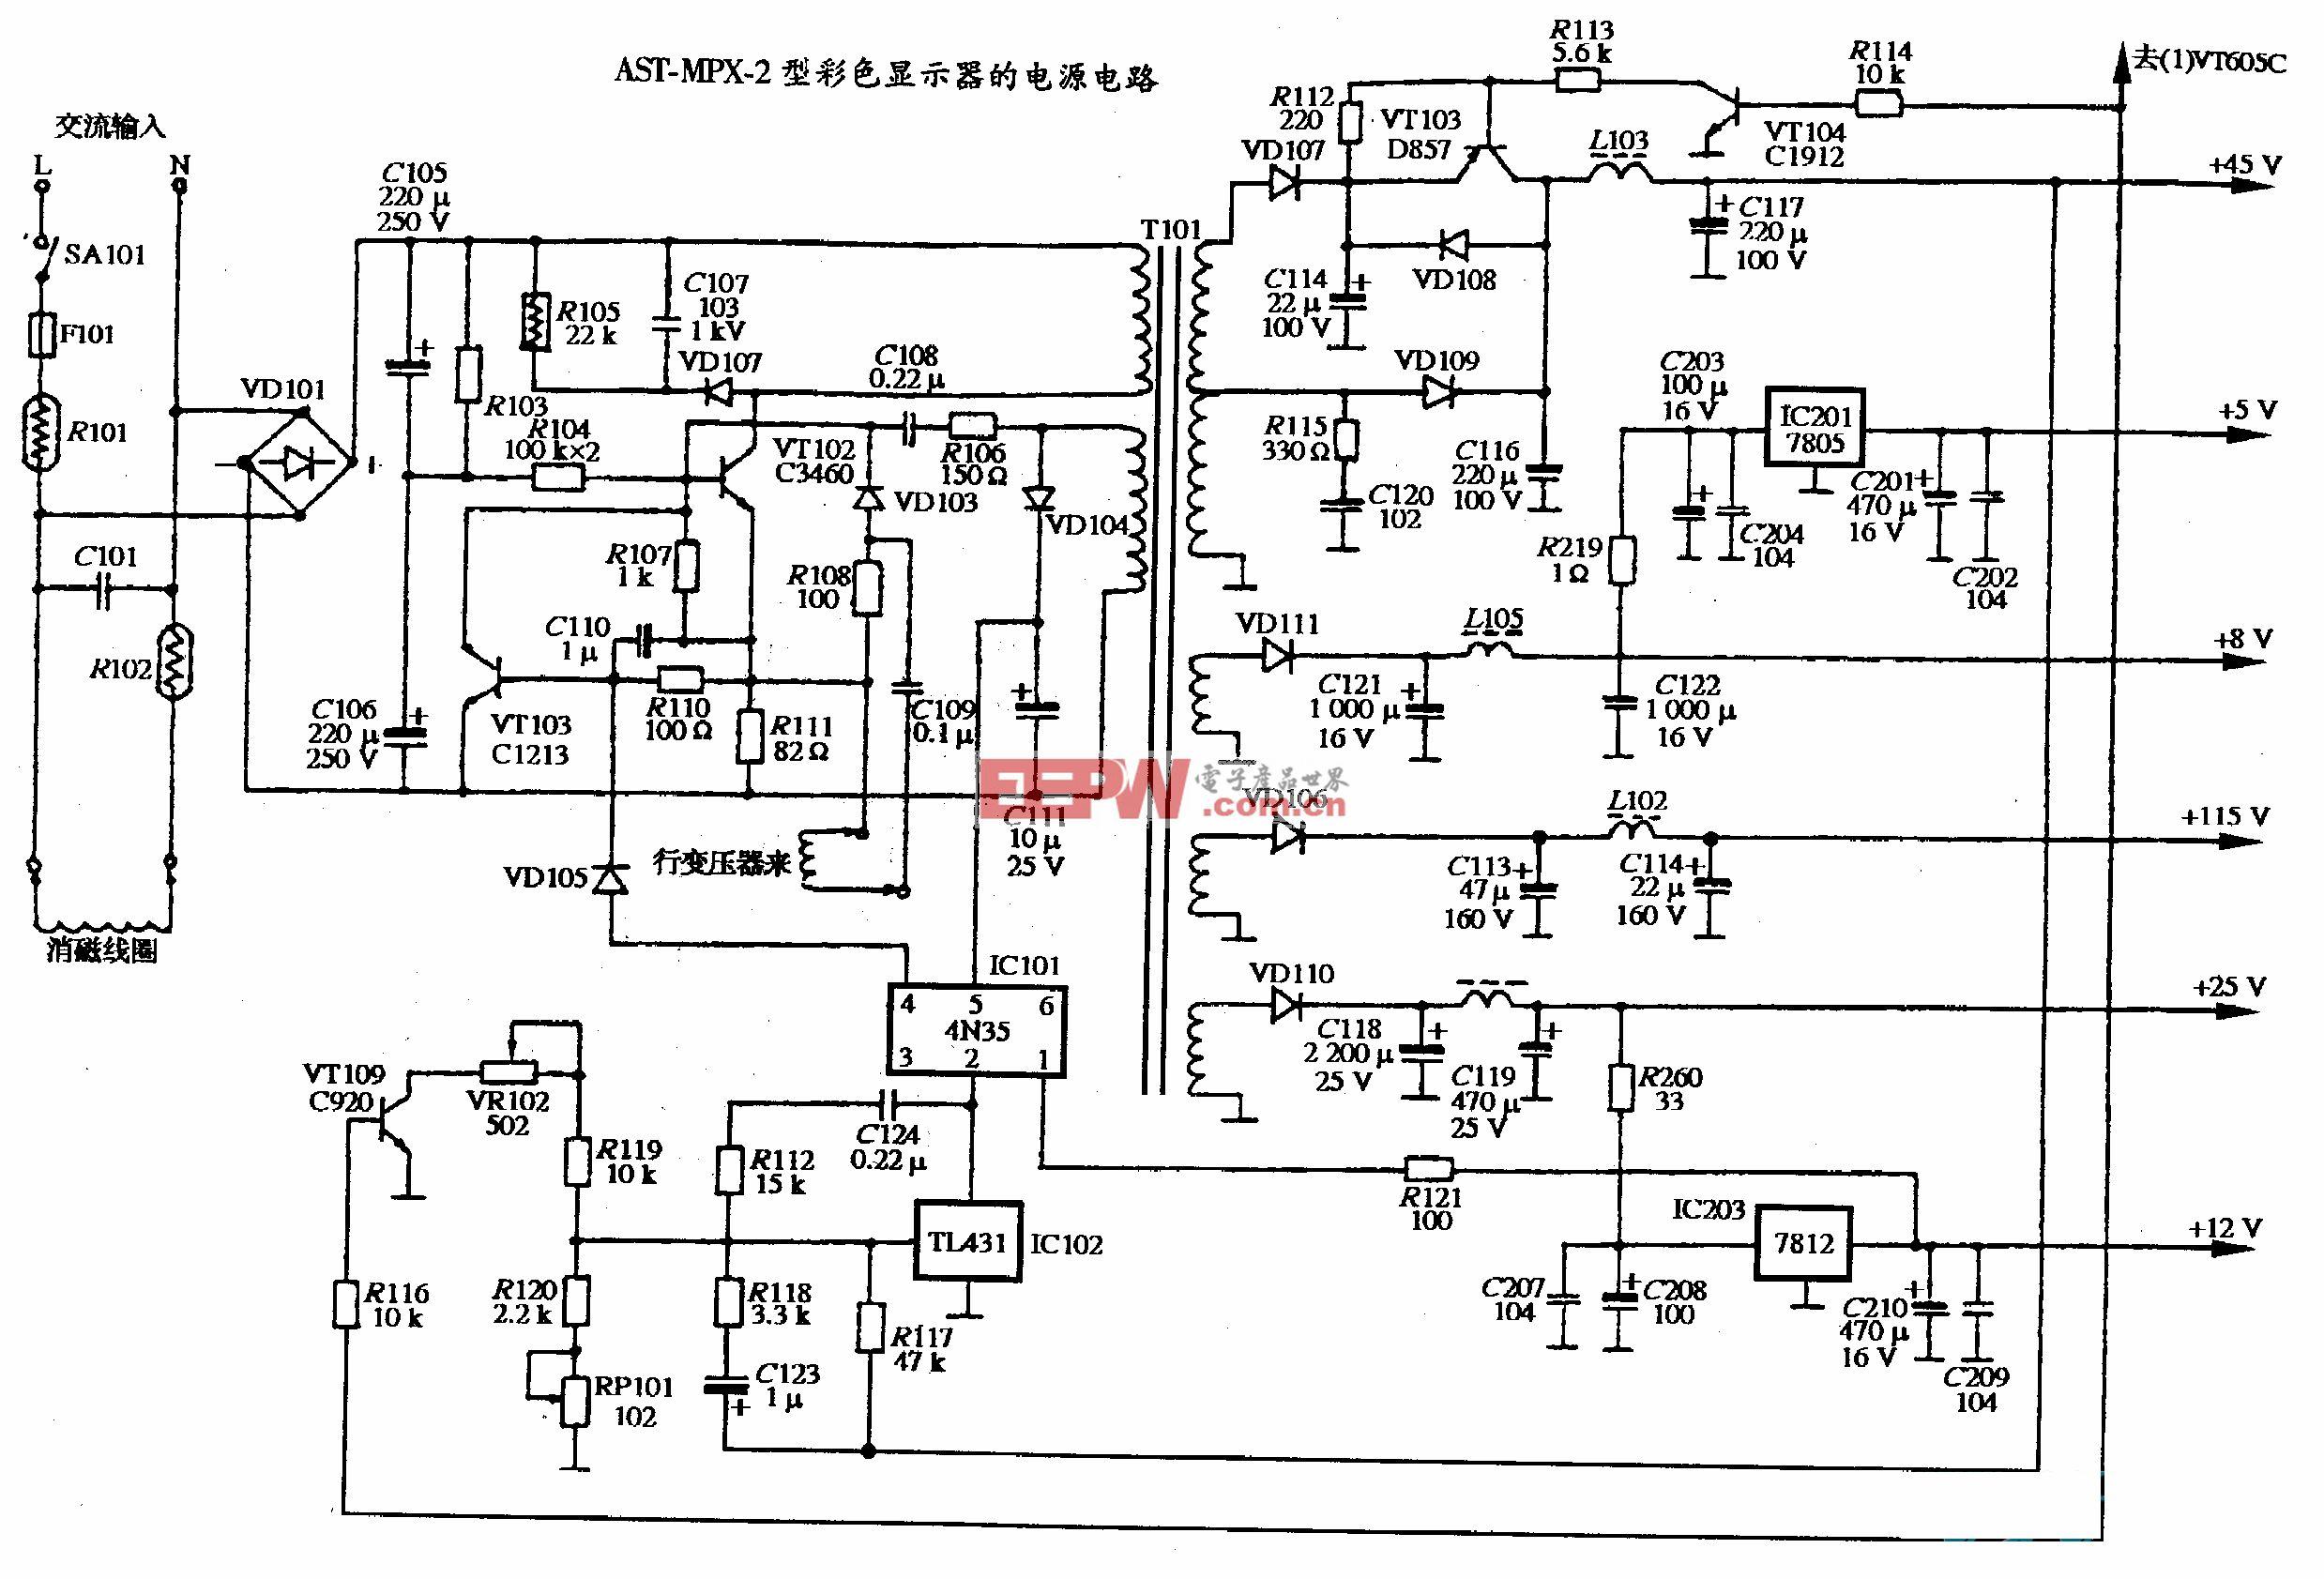 AST MPX-2型彩色显示器的电源电路图